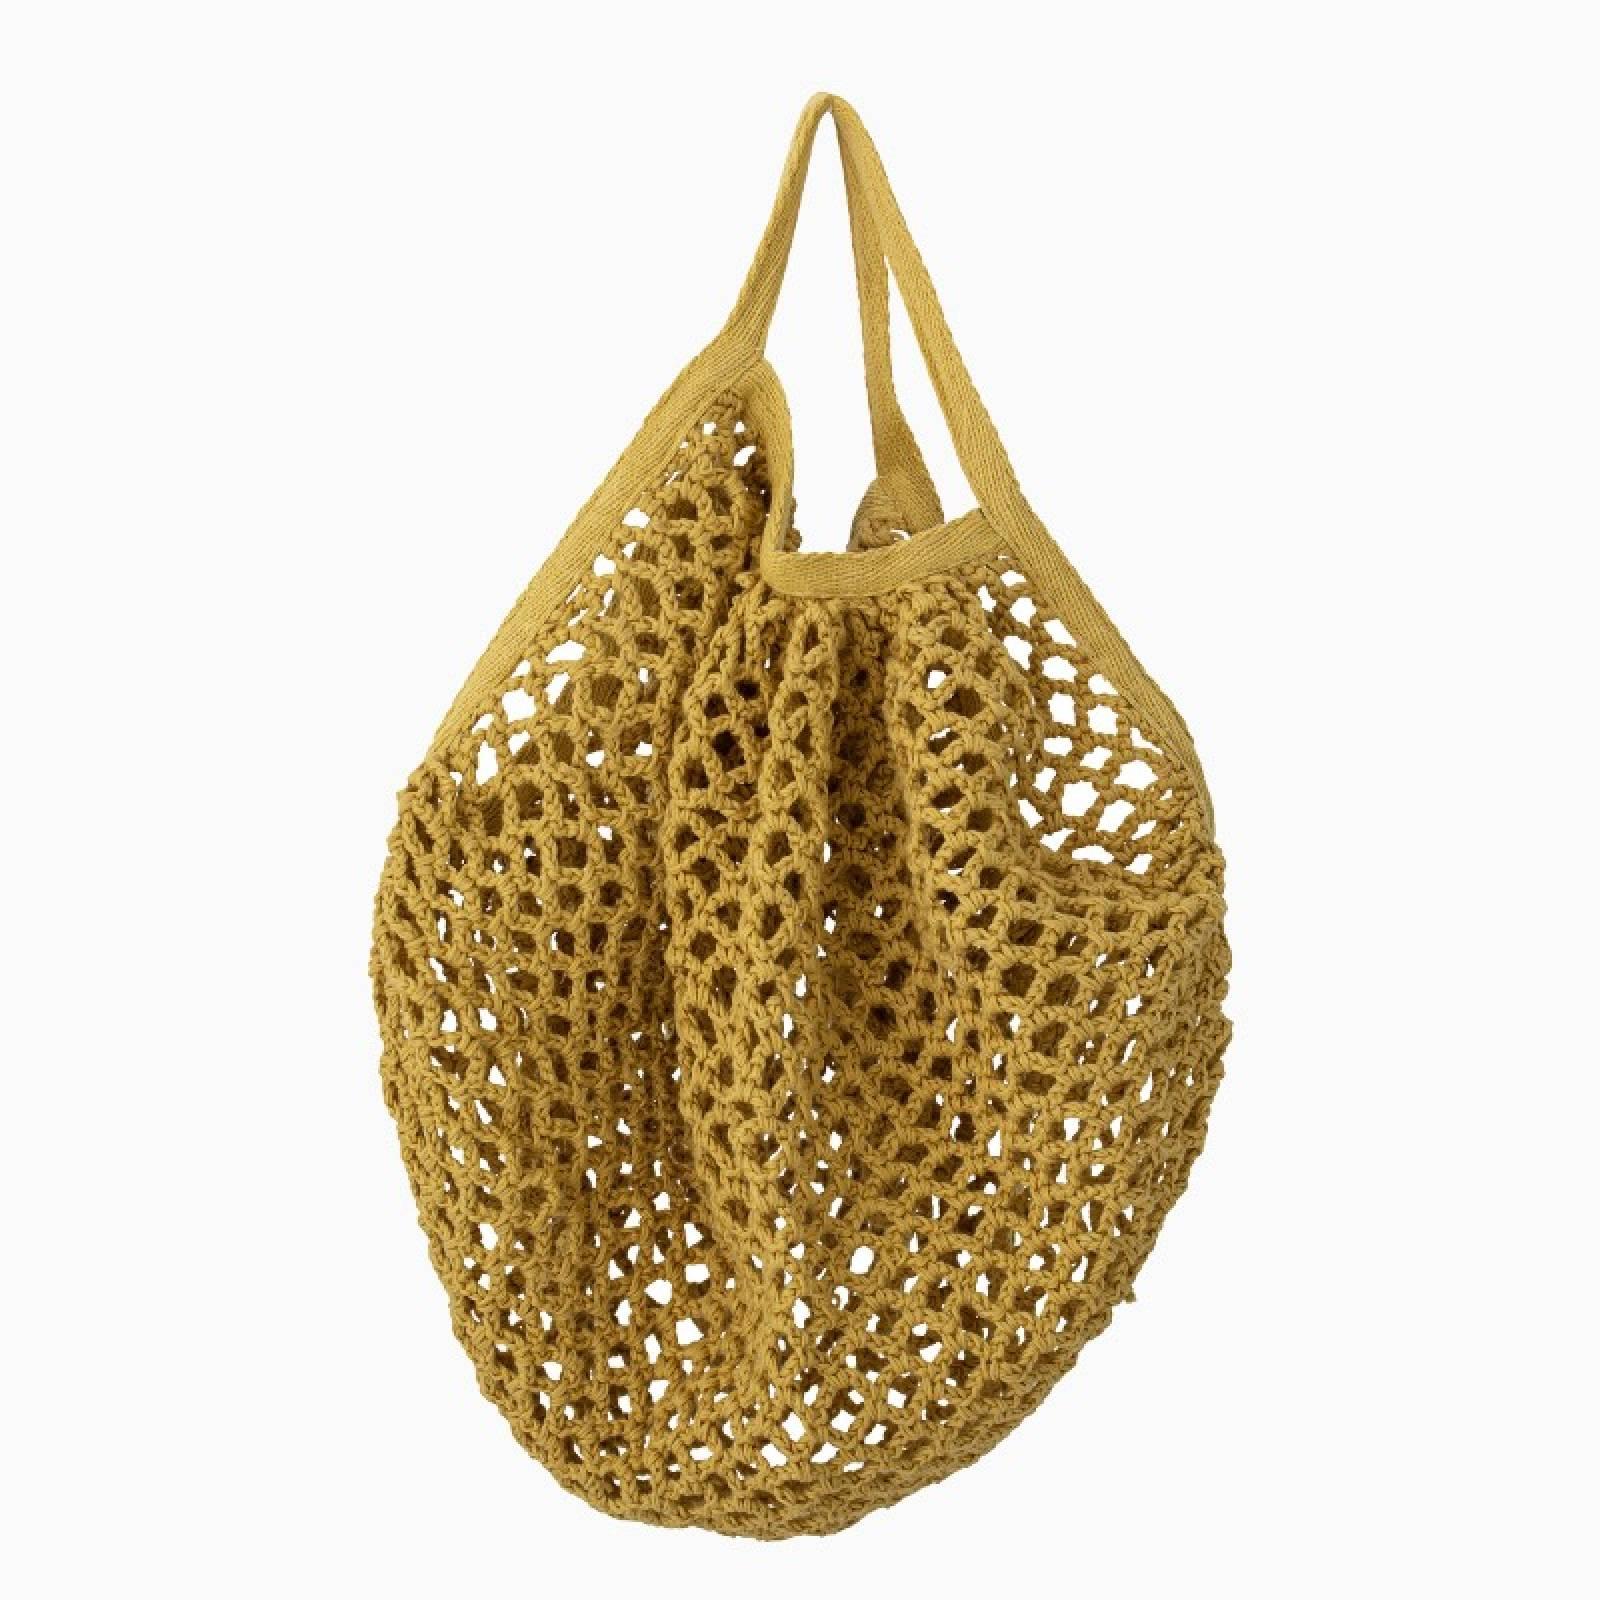 Mini Woven Cotton String Bag In Yellow